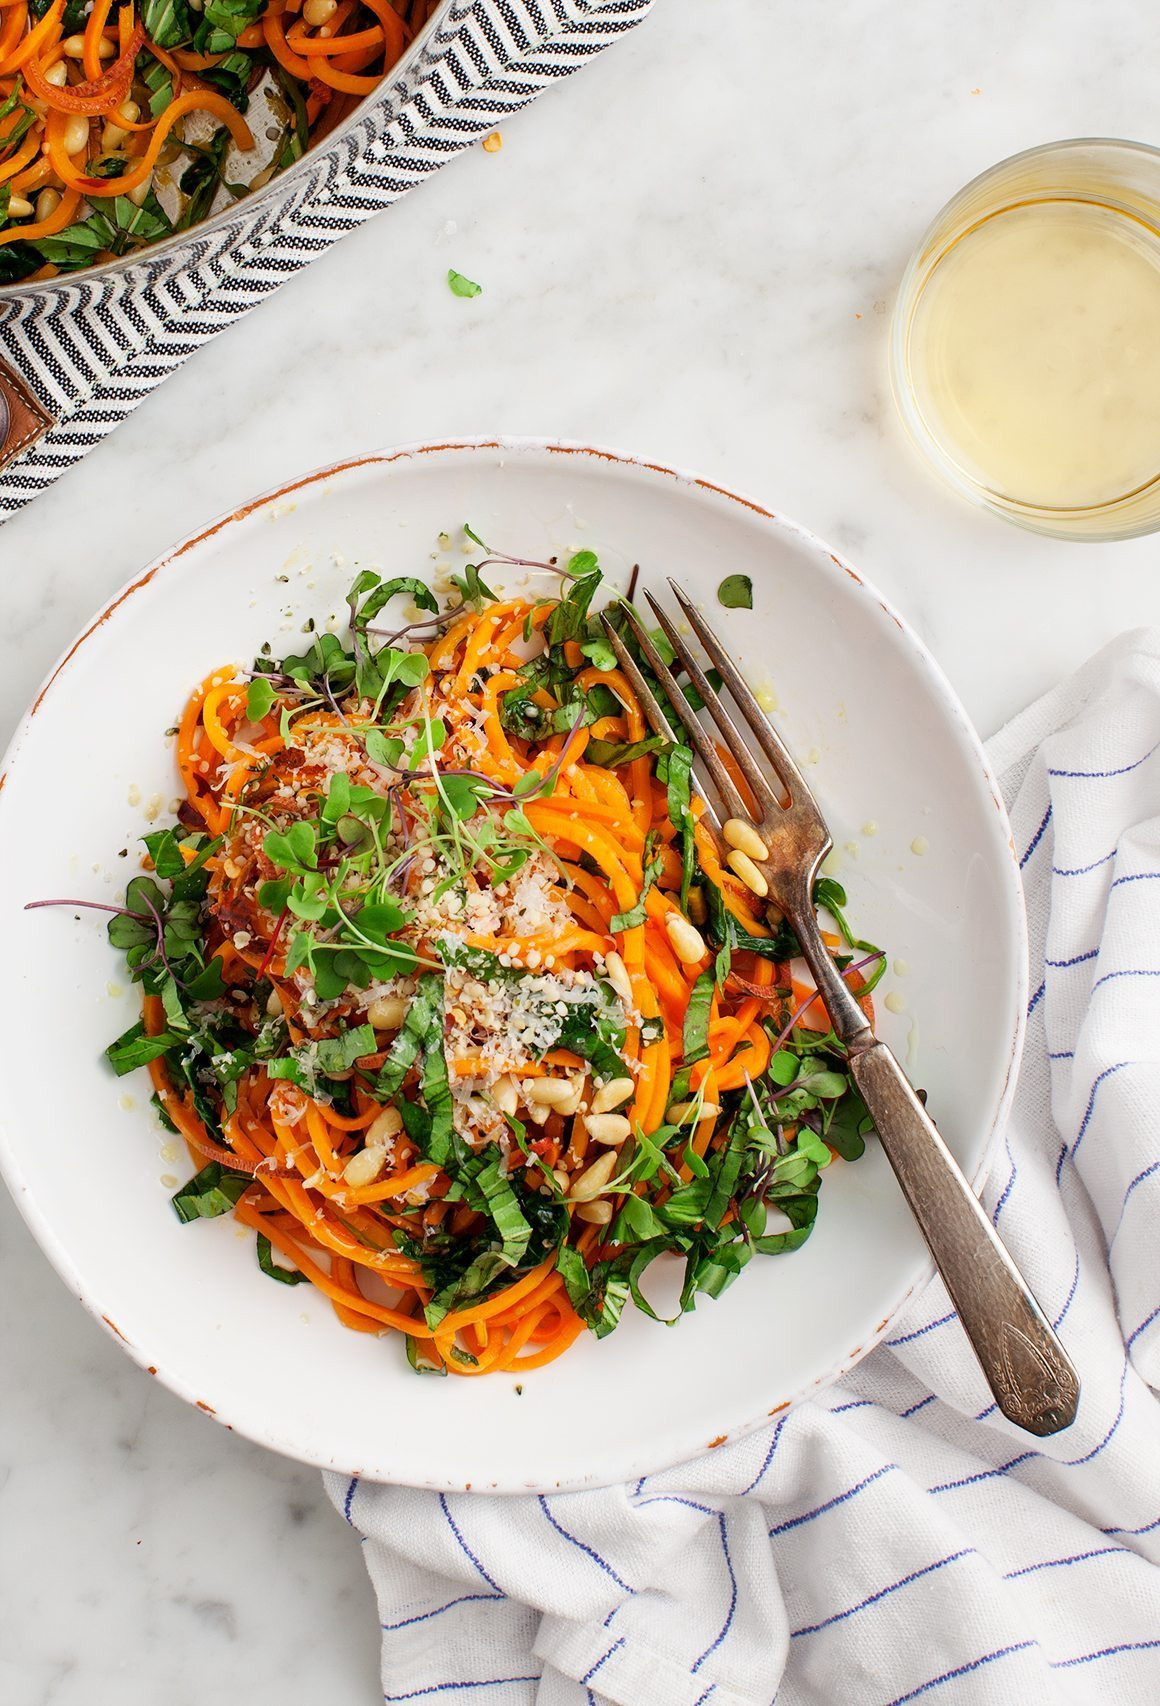 Healthy Vegetarian Dinner Ideas  Healthy Ve arian Dinner Recipes Love and Lemons